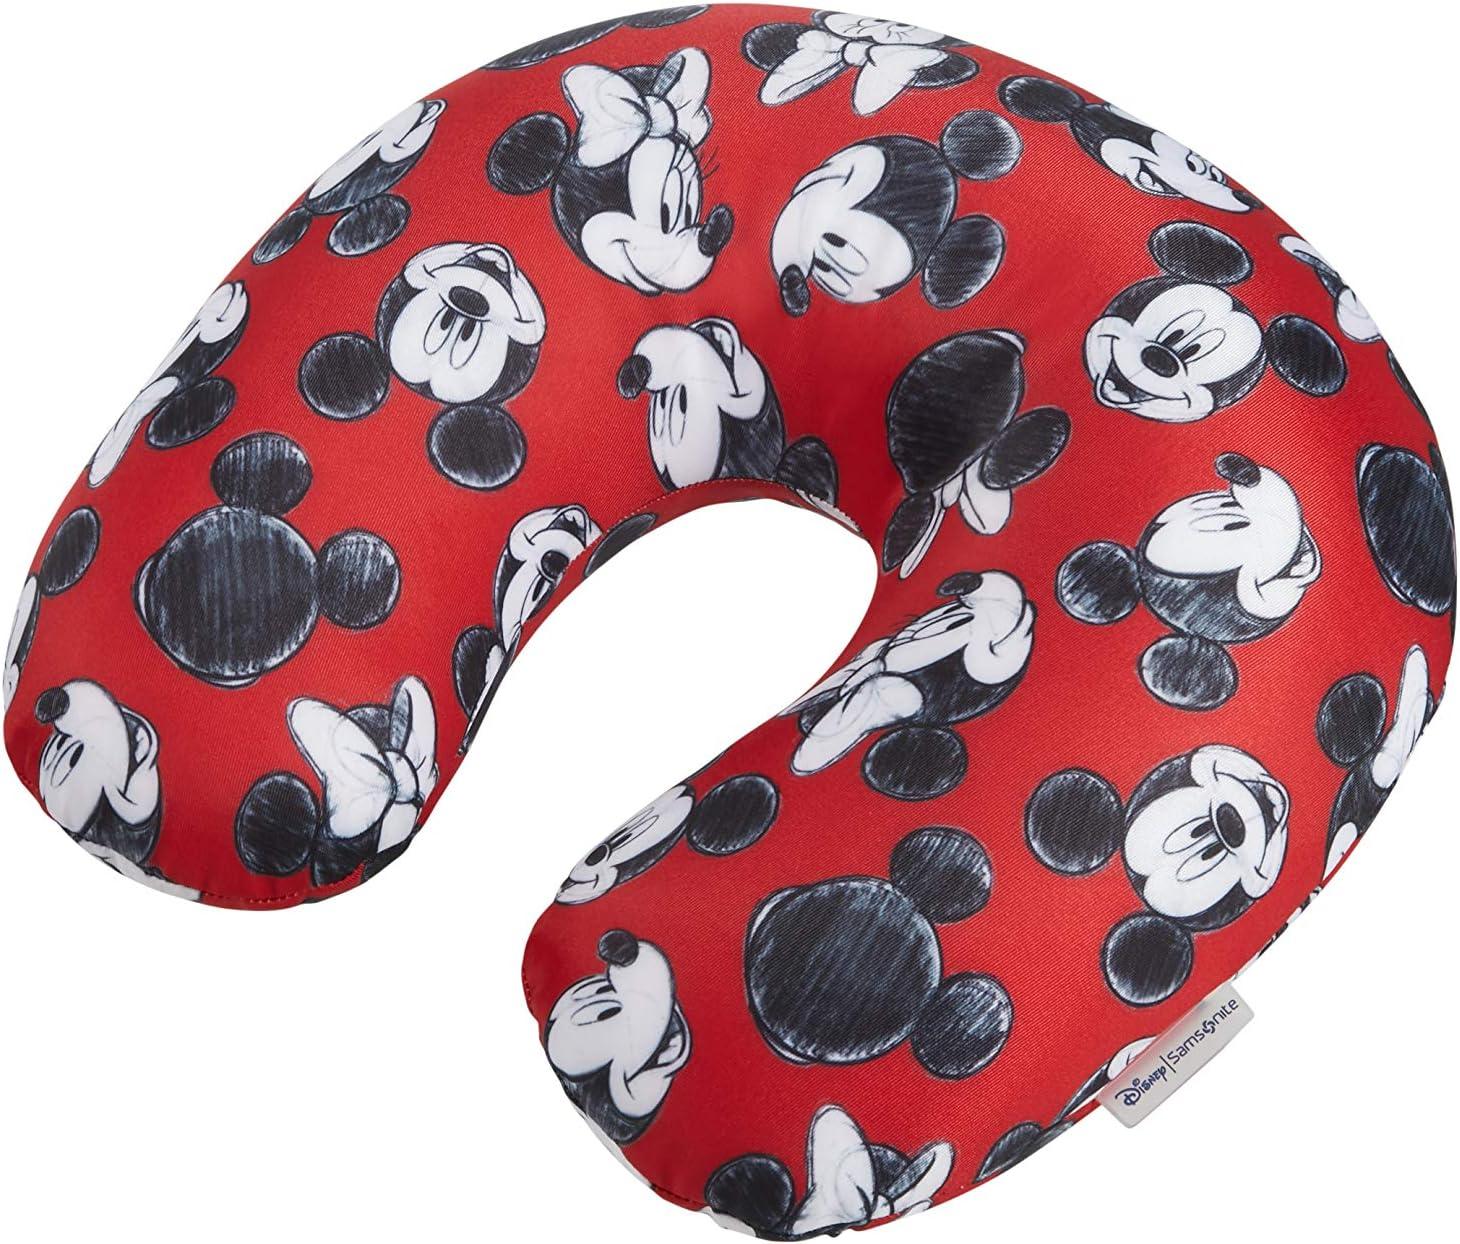 Samsonite Global Ta Disney Microbead Almohada de Viaje, 32 cm, Rojo (Mickey/Minnie Red)